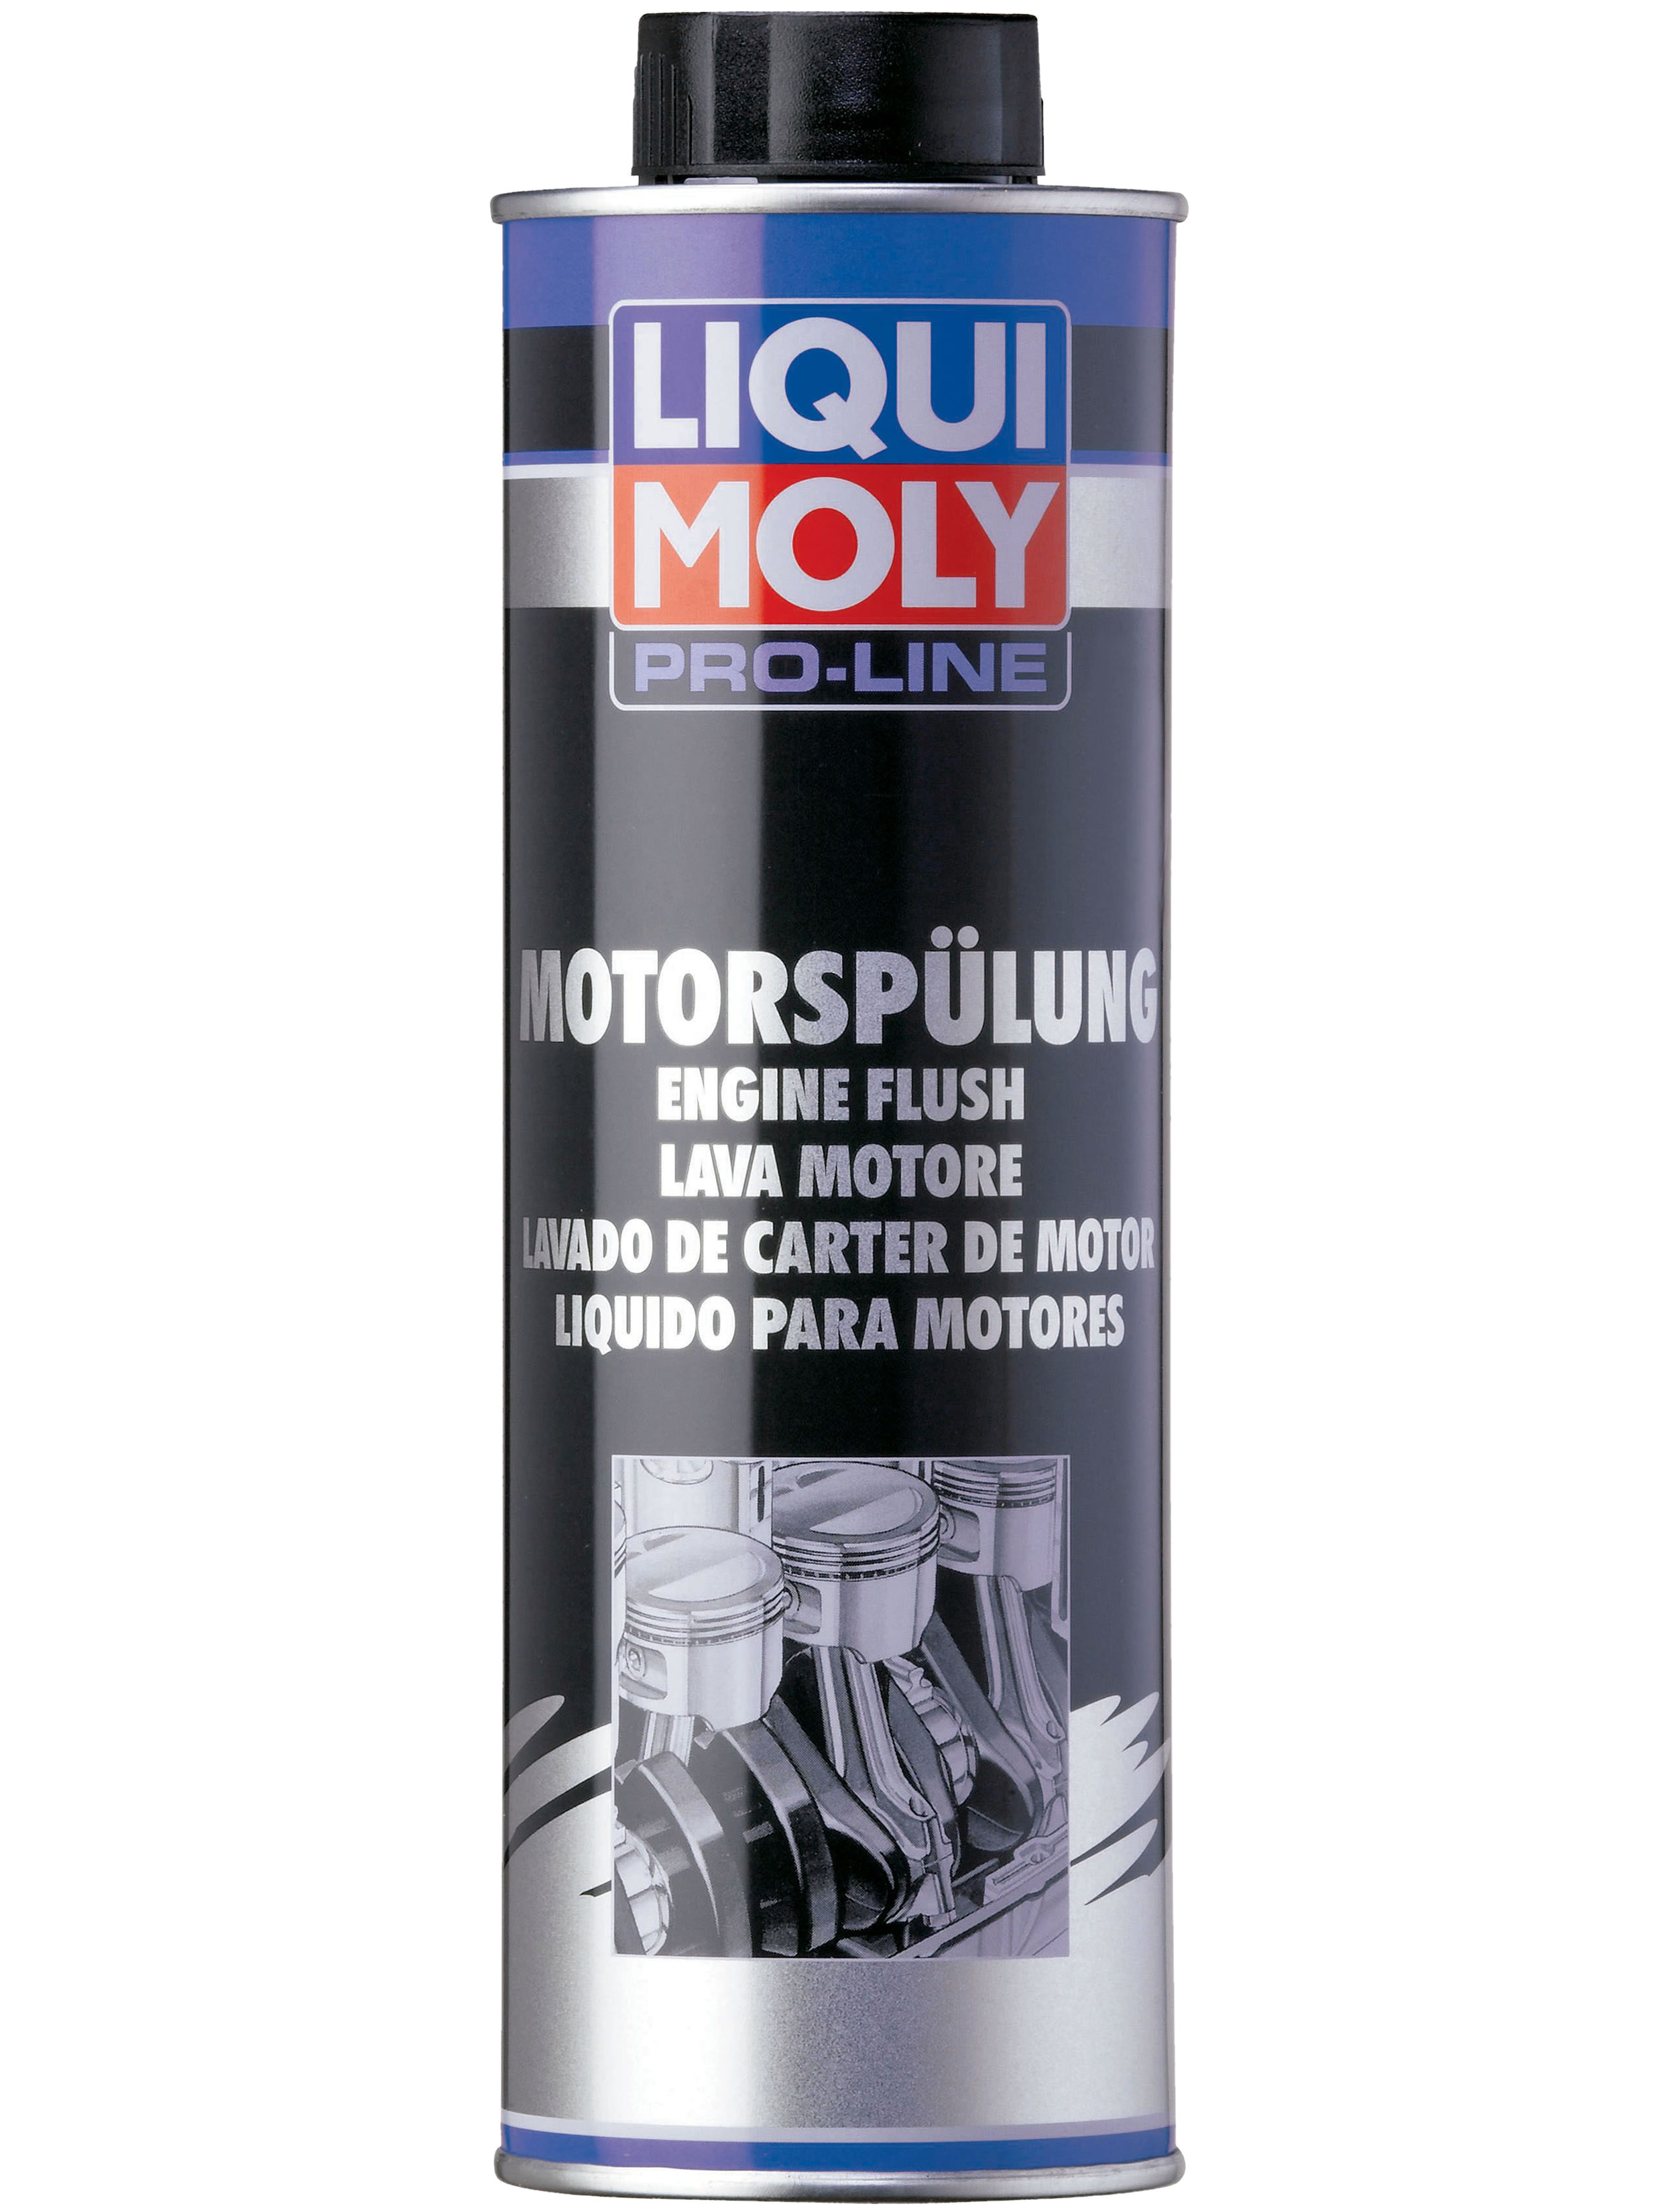 Liqui moly 1990 инструкция